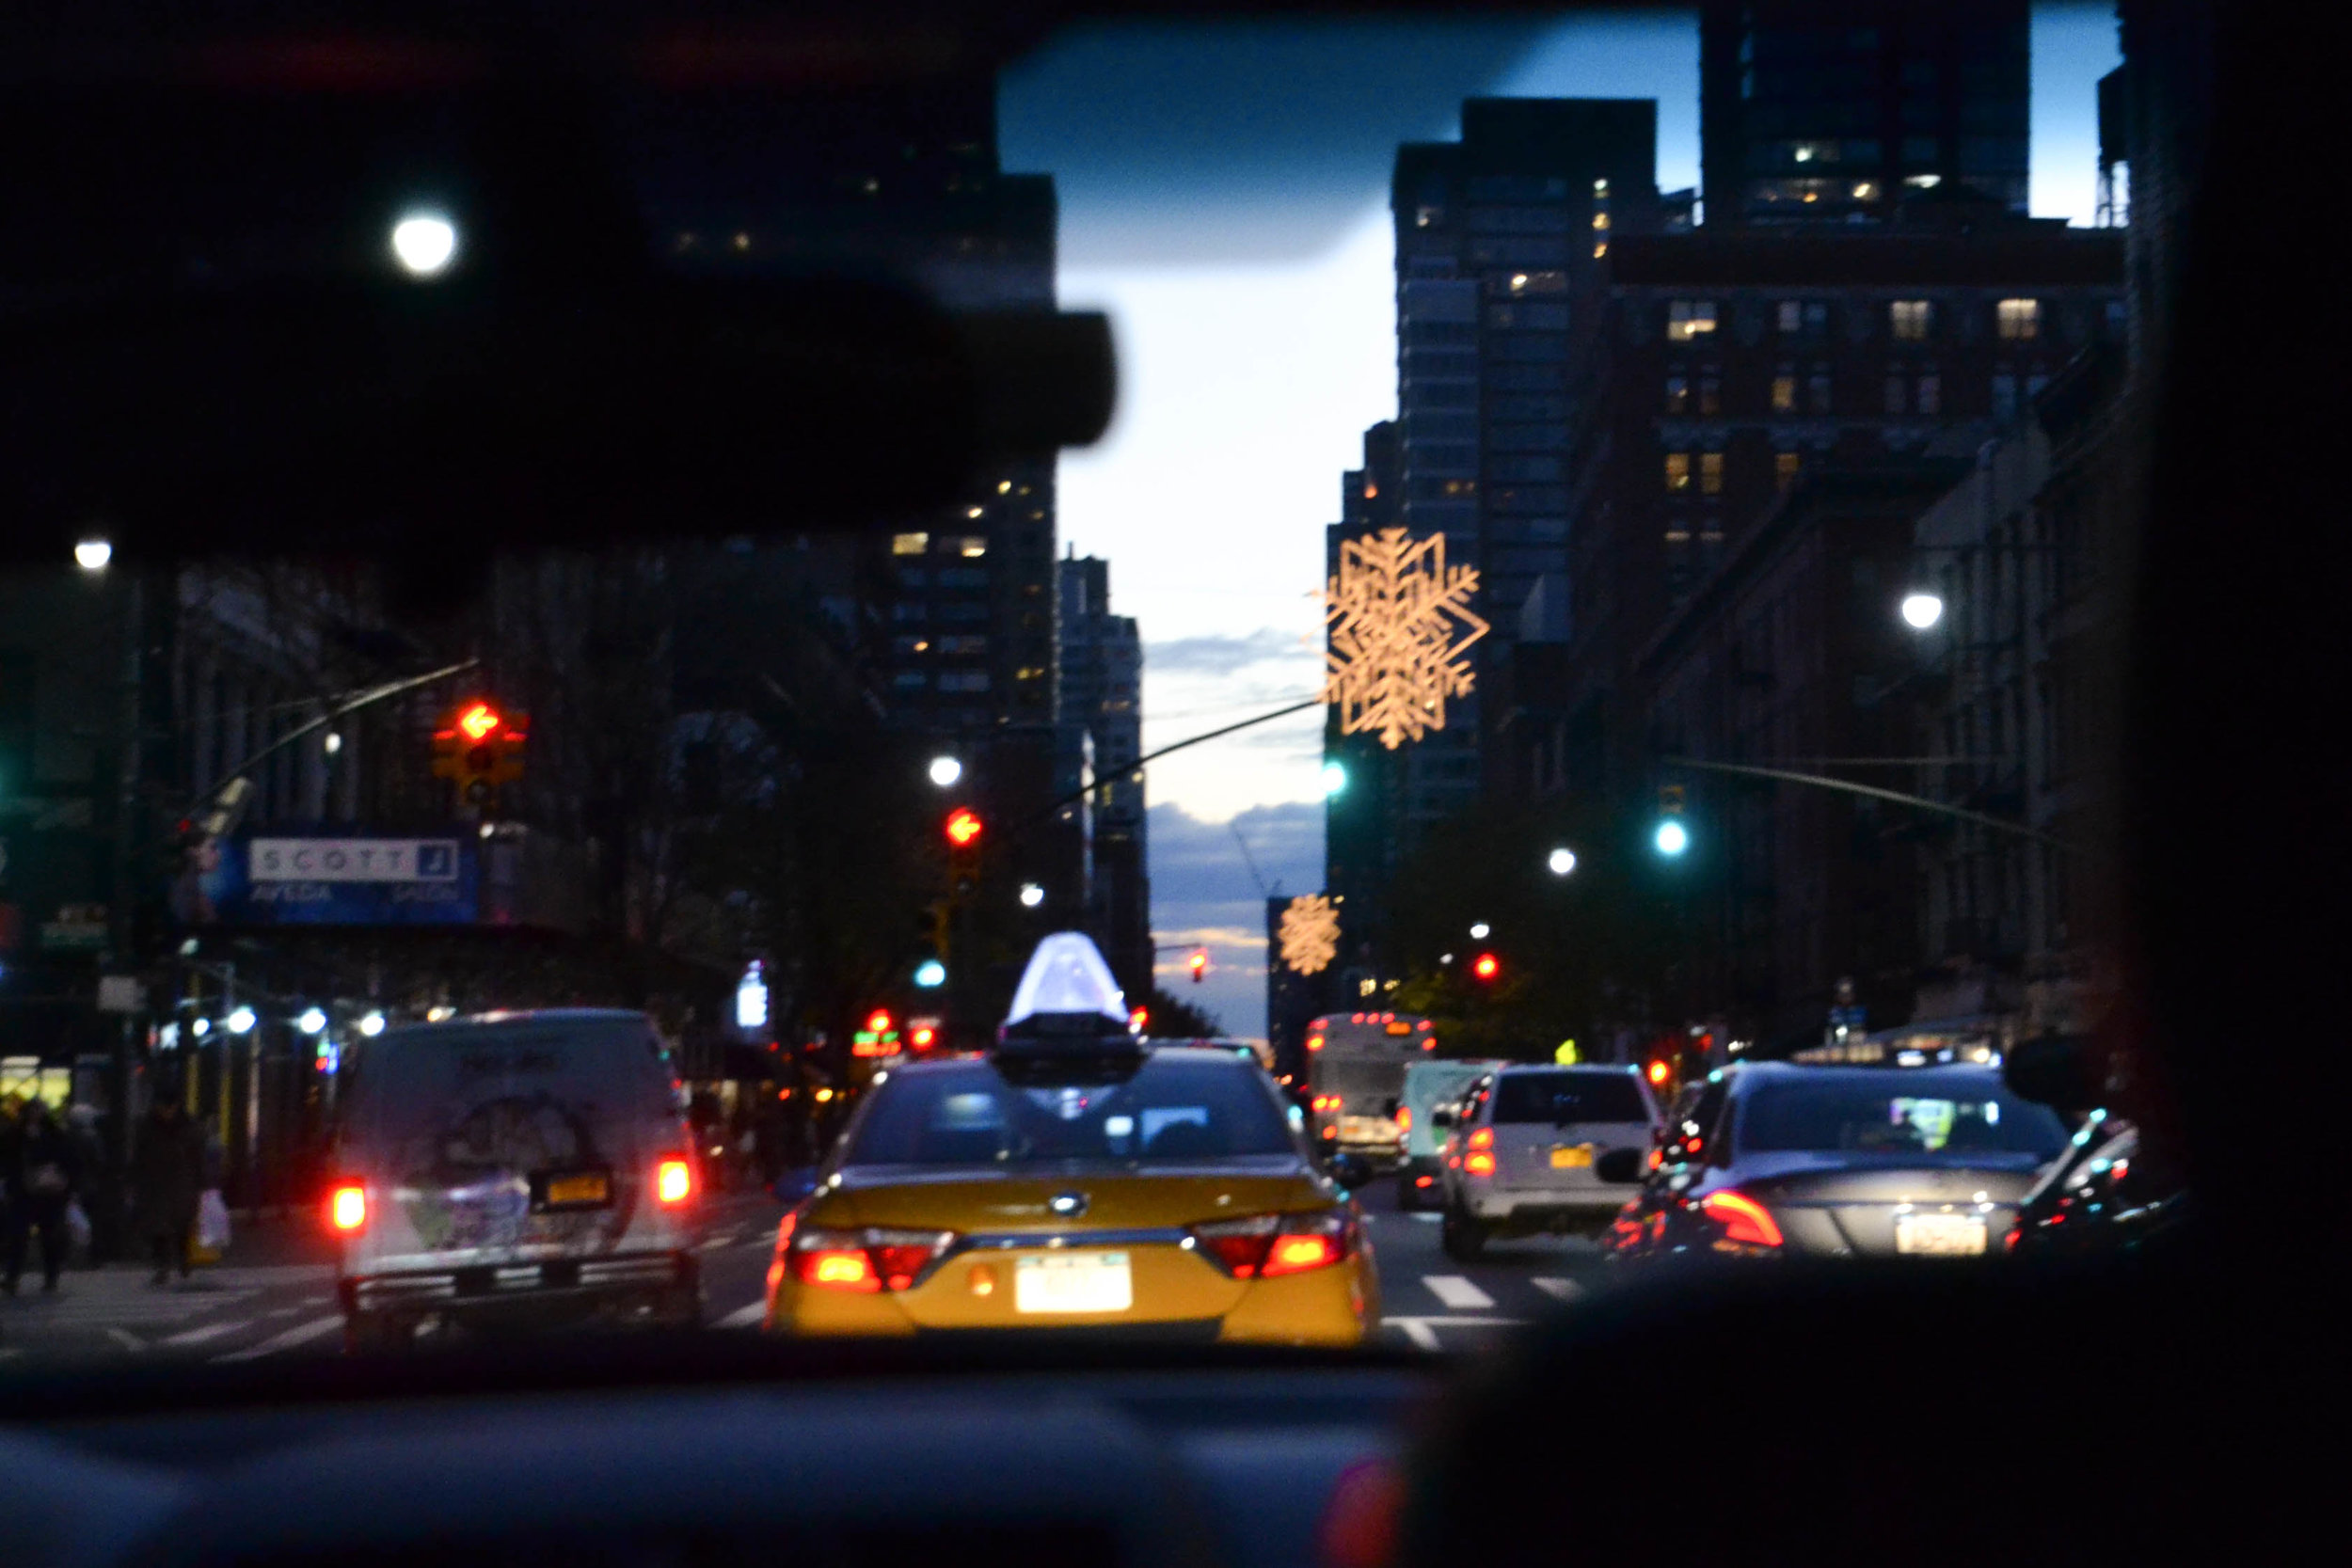 christmas_in_newyork-13.jpg